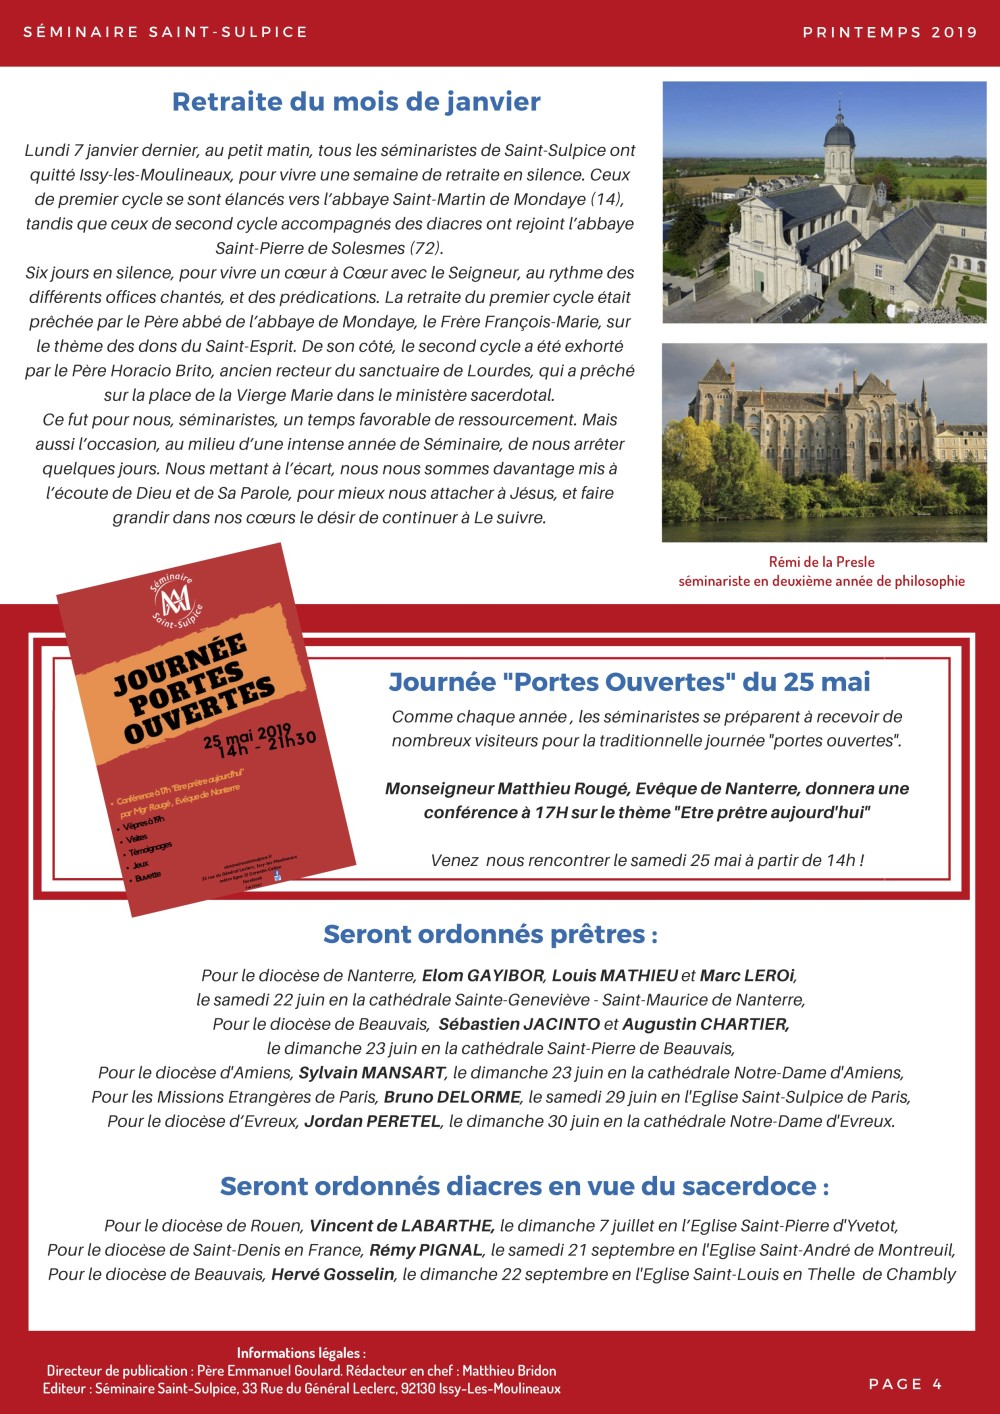 Newsletter Séminaire Saint-Sulpice mai 2019 - p4